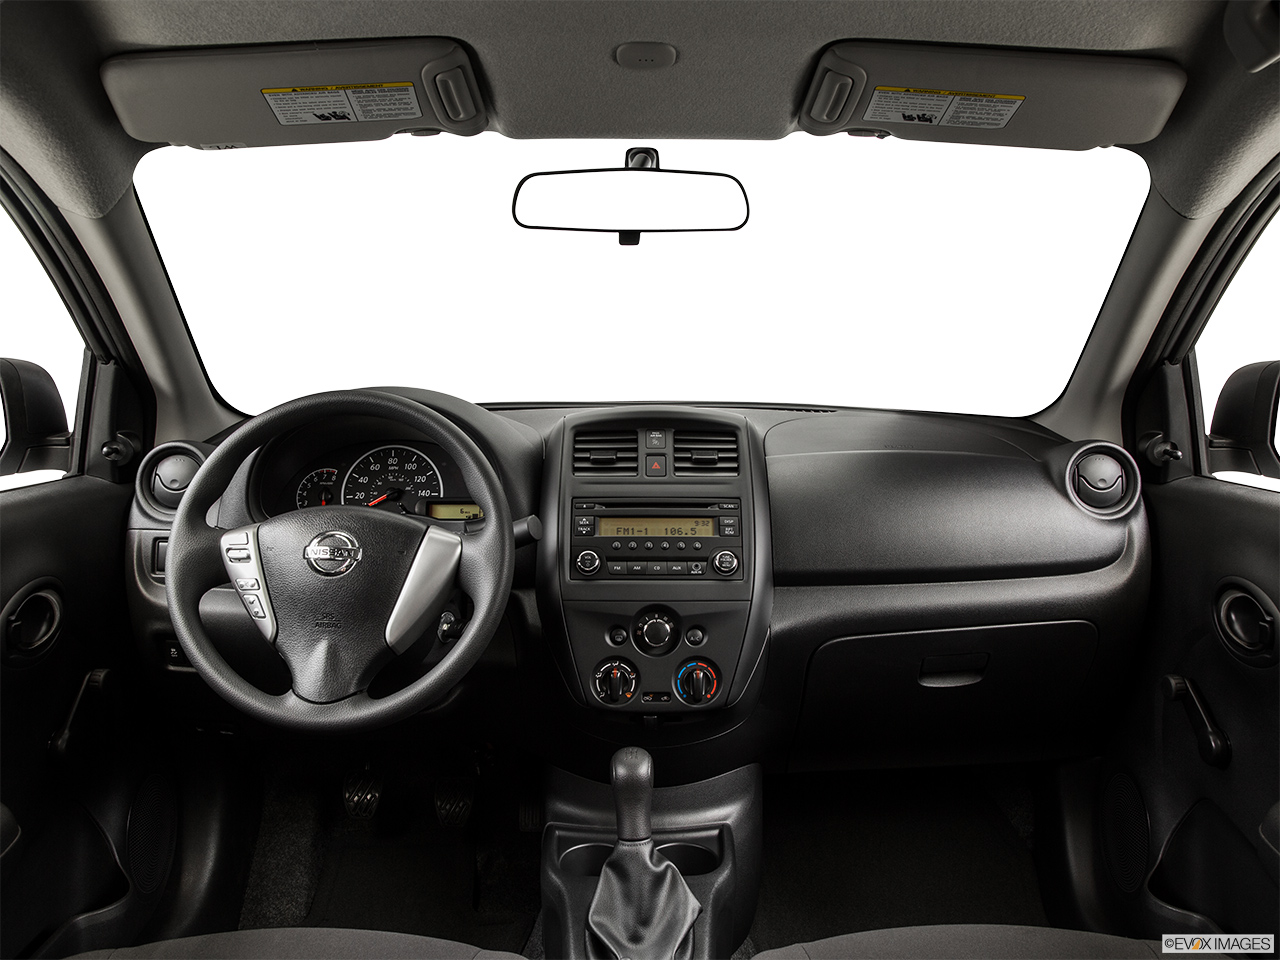 Nissan Car Video Gallery Videos Altima Maxima Cube 370z